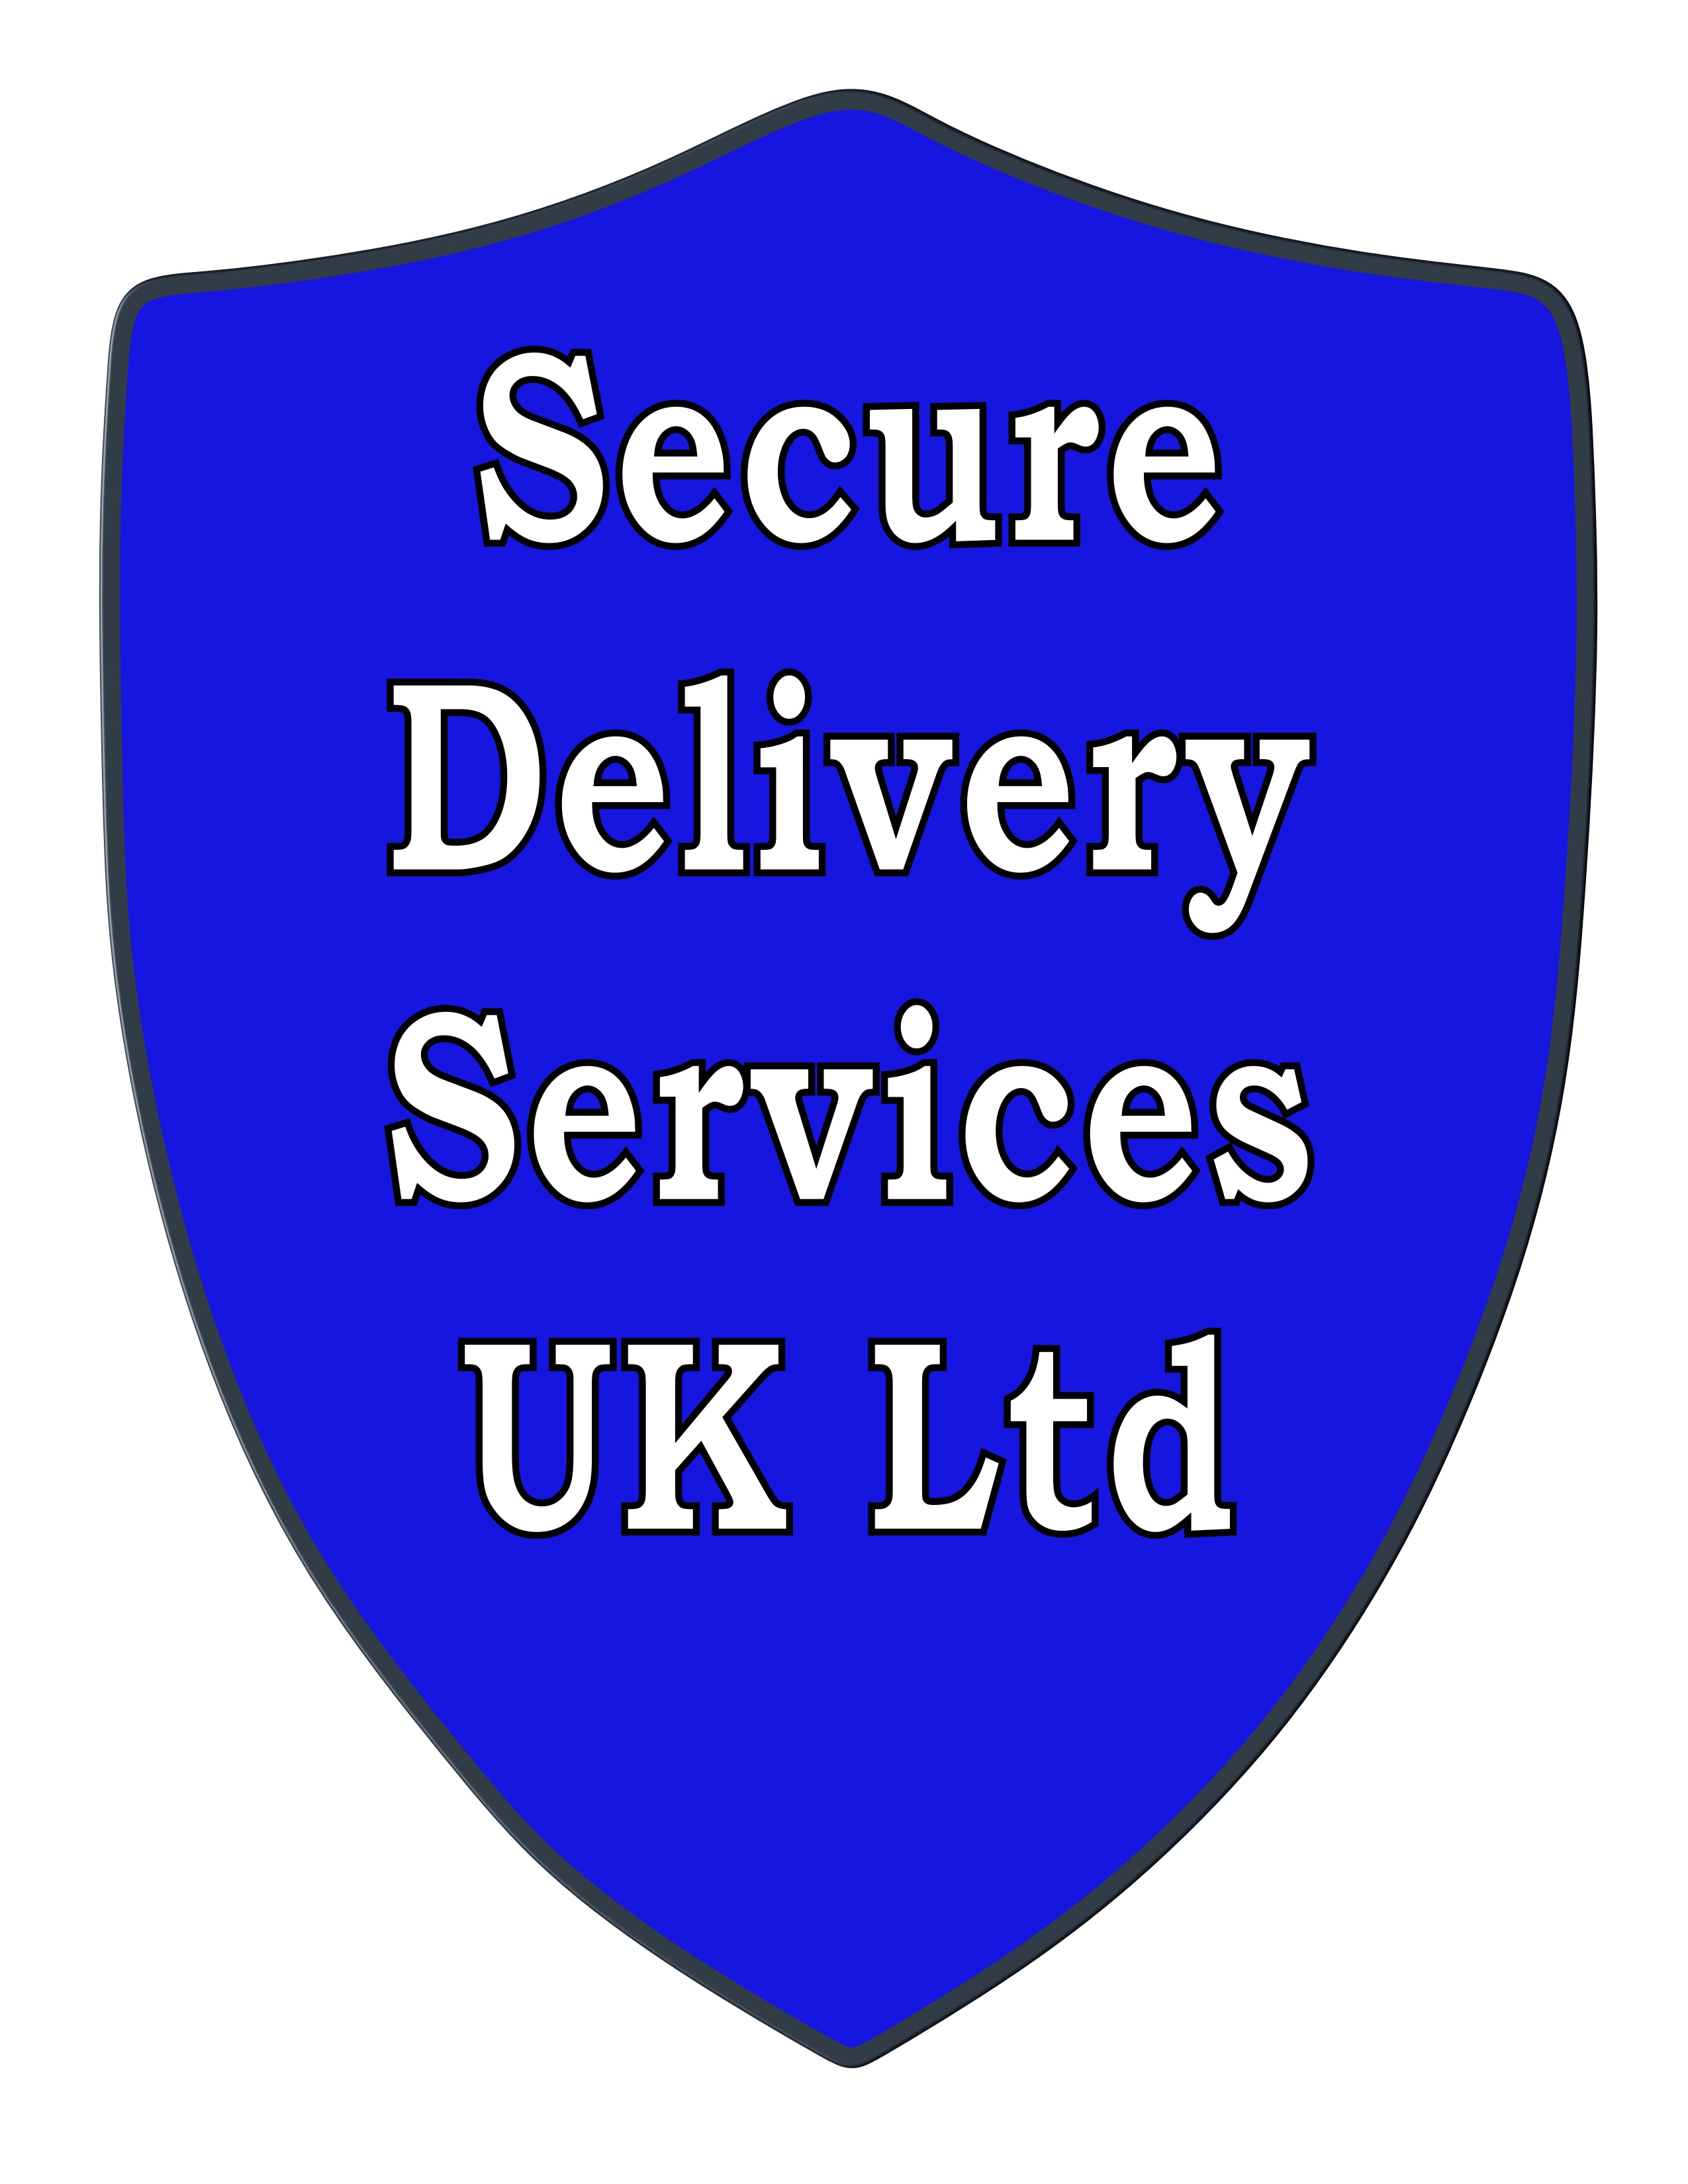 Secure Delivery Services UK Ltd